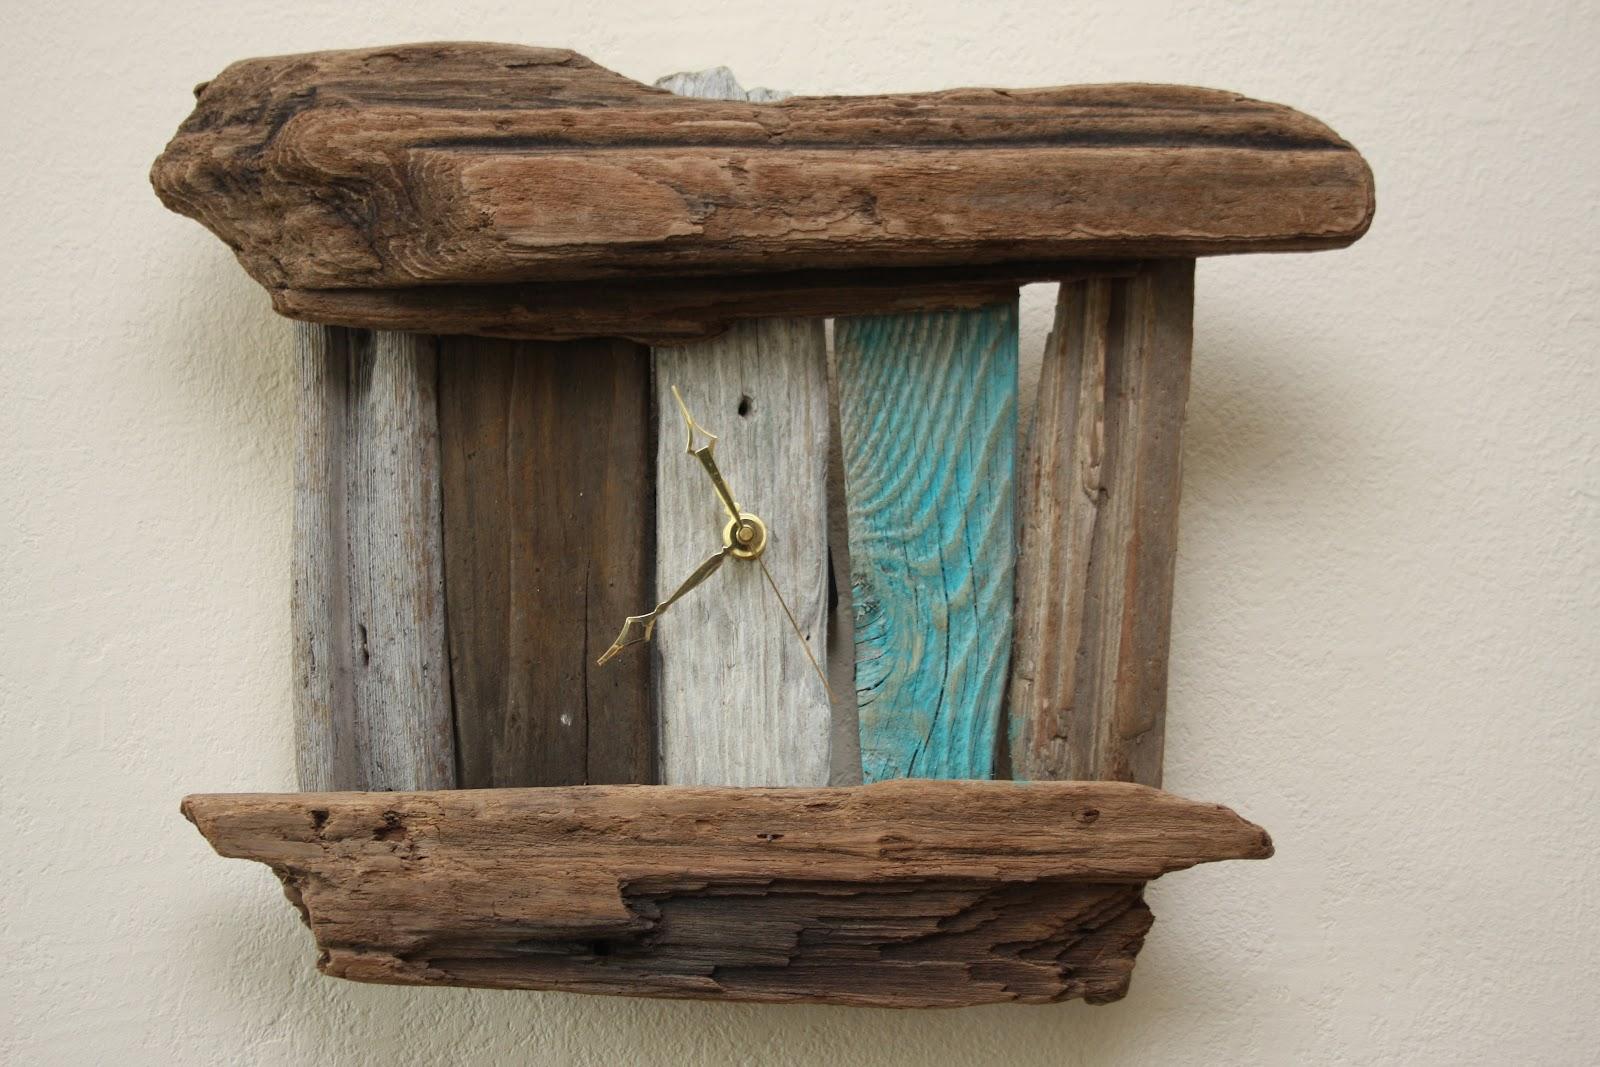 alibi interiors driftwood creations. Black Bedroom Furniture Sets. Home Design Ideas